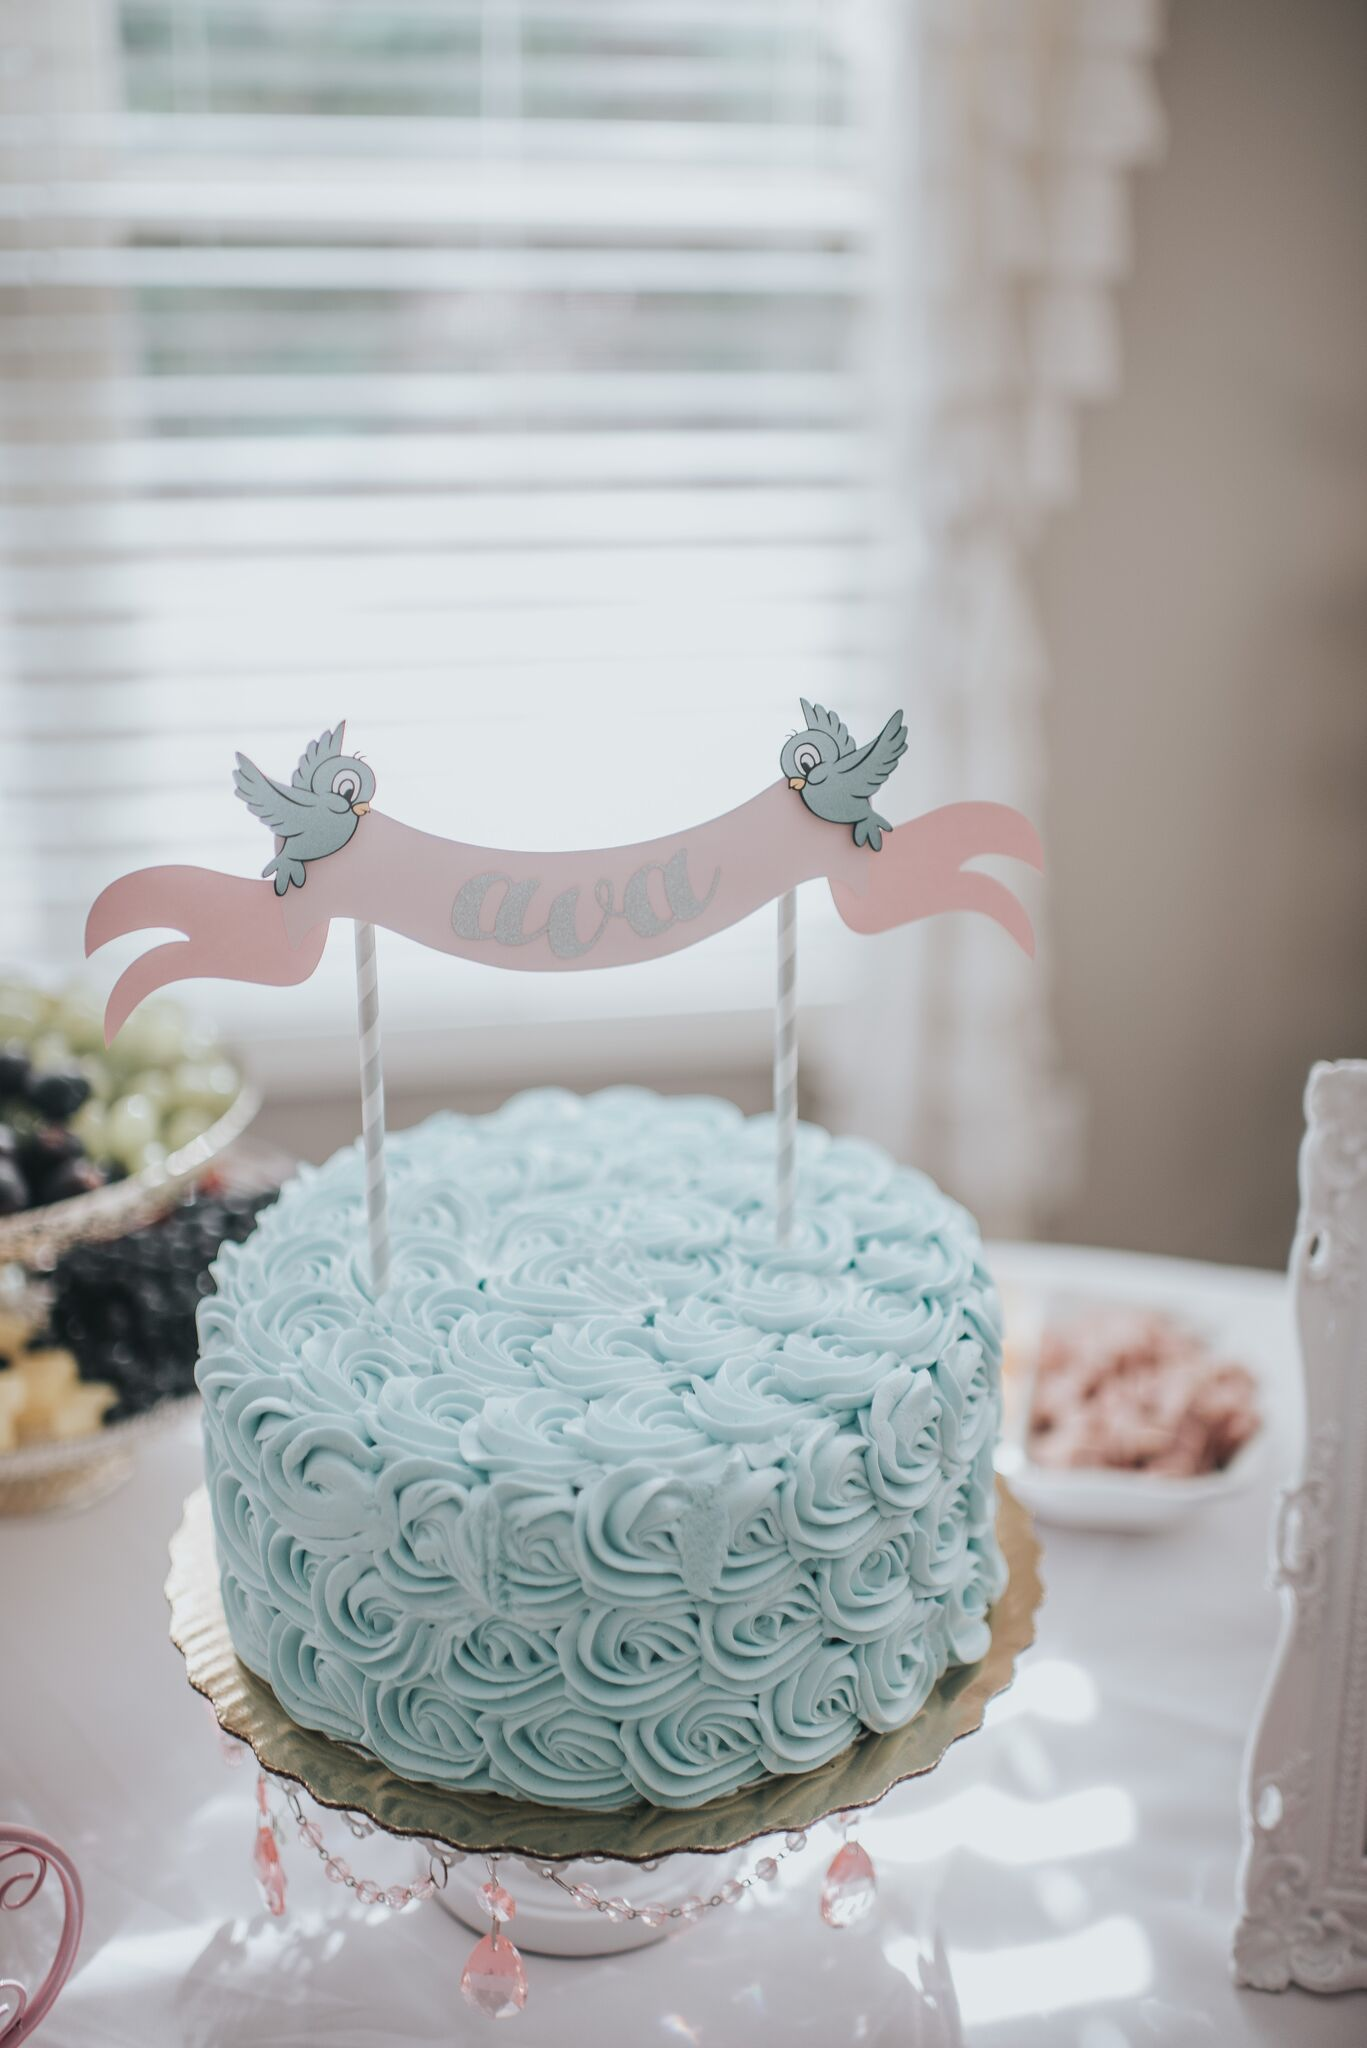 Avau0027s Cinderella 3rd Birthday. Cinderella Baby ShowerCinderella ...